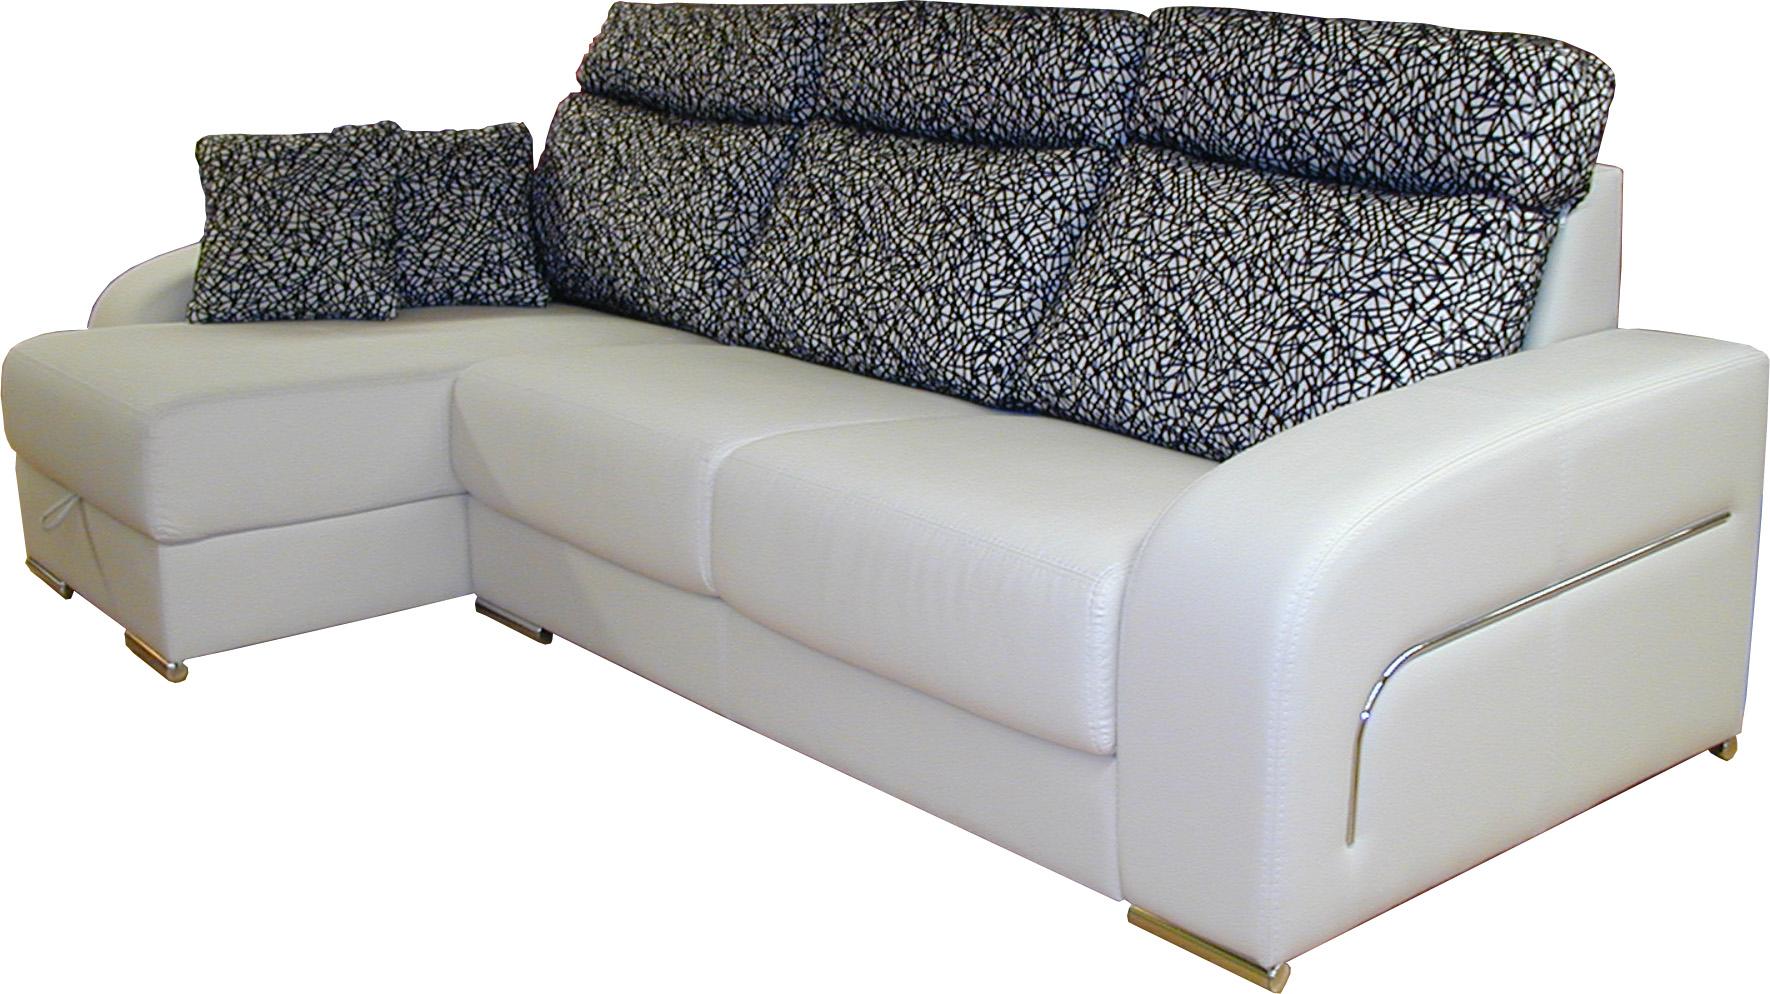 Sofa chaise longue arcon asiento deslizante dolce 4 patas - Sofa 4 plazas chaise longue ...